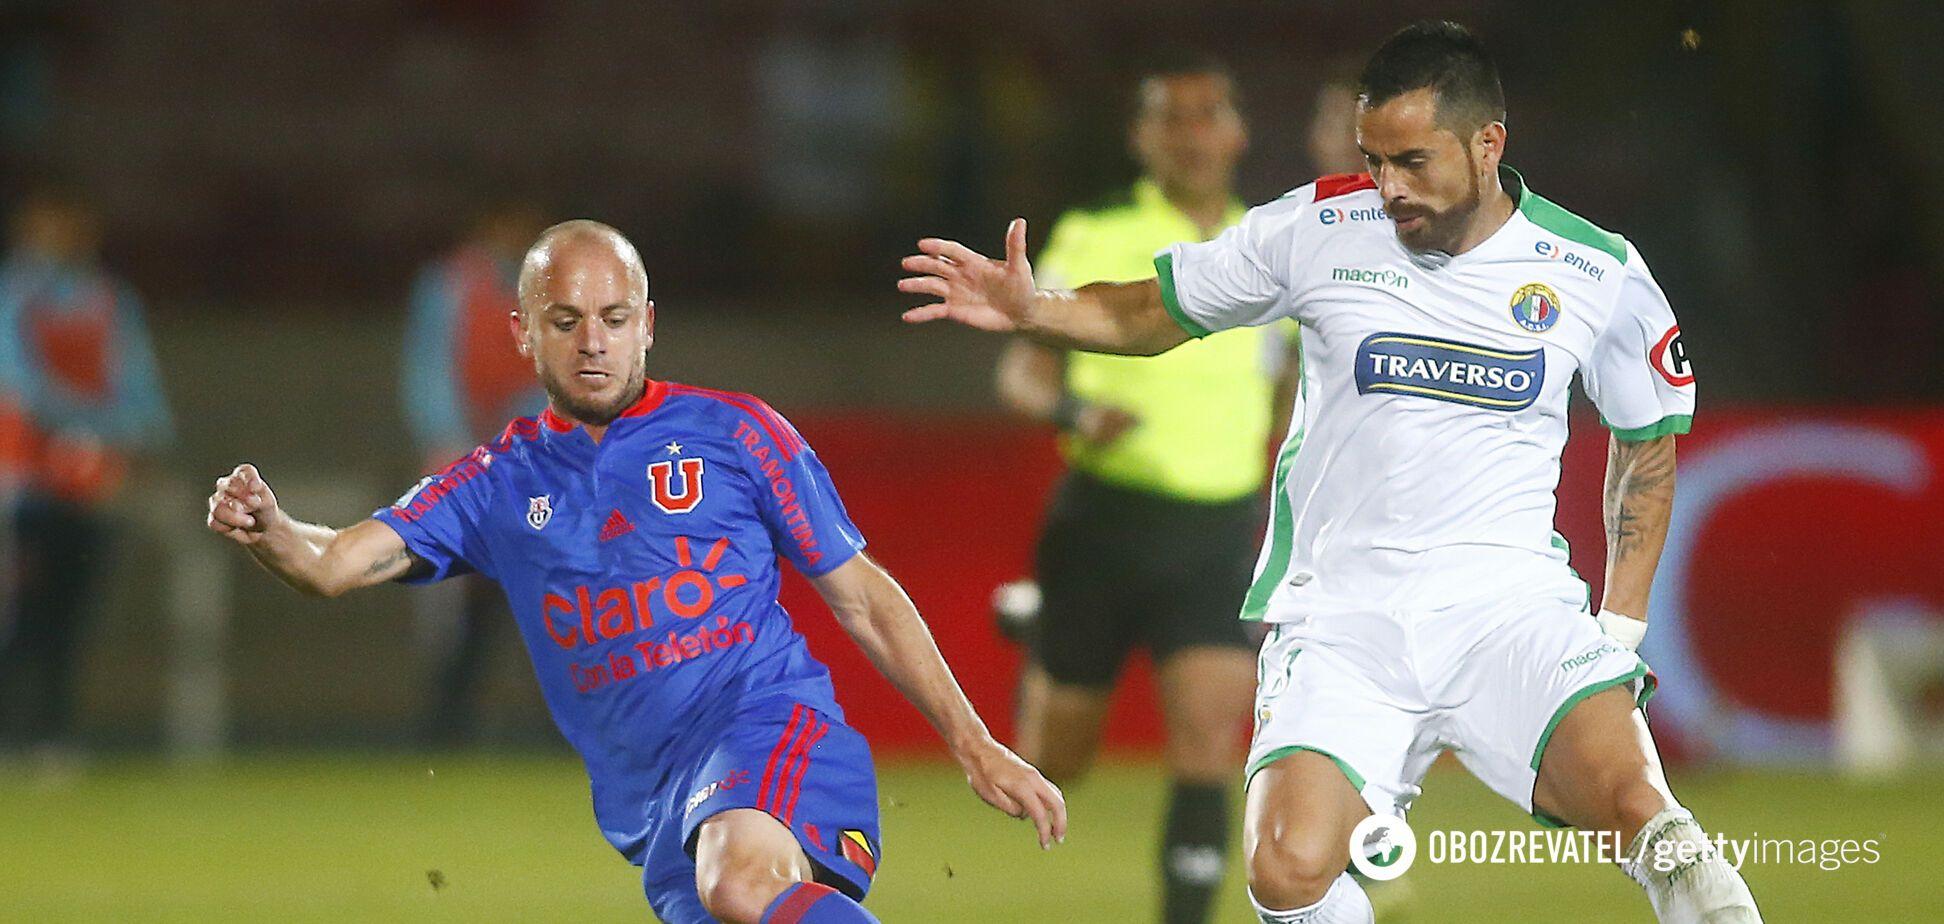 Густаво Лоренсетти (слева) в матче против 'Аудакс Итальяно'